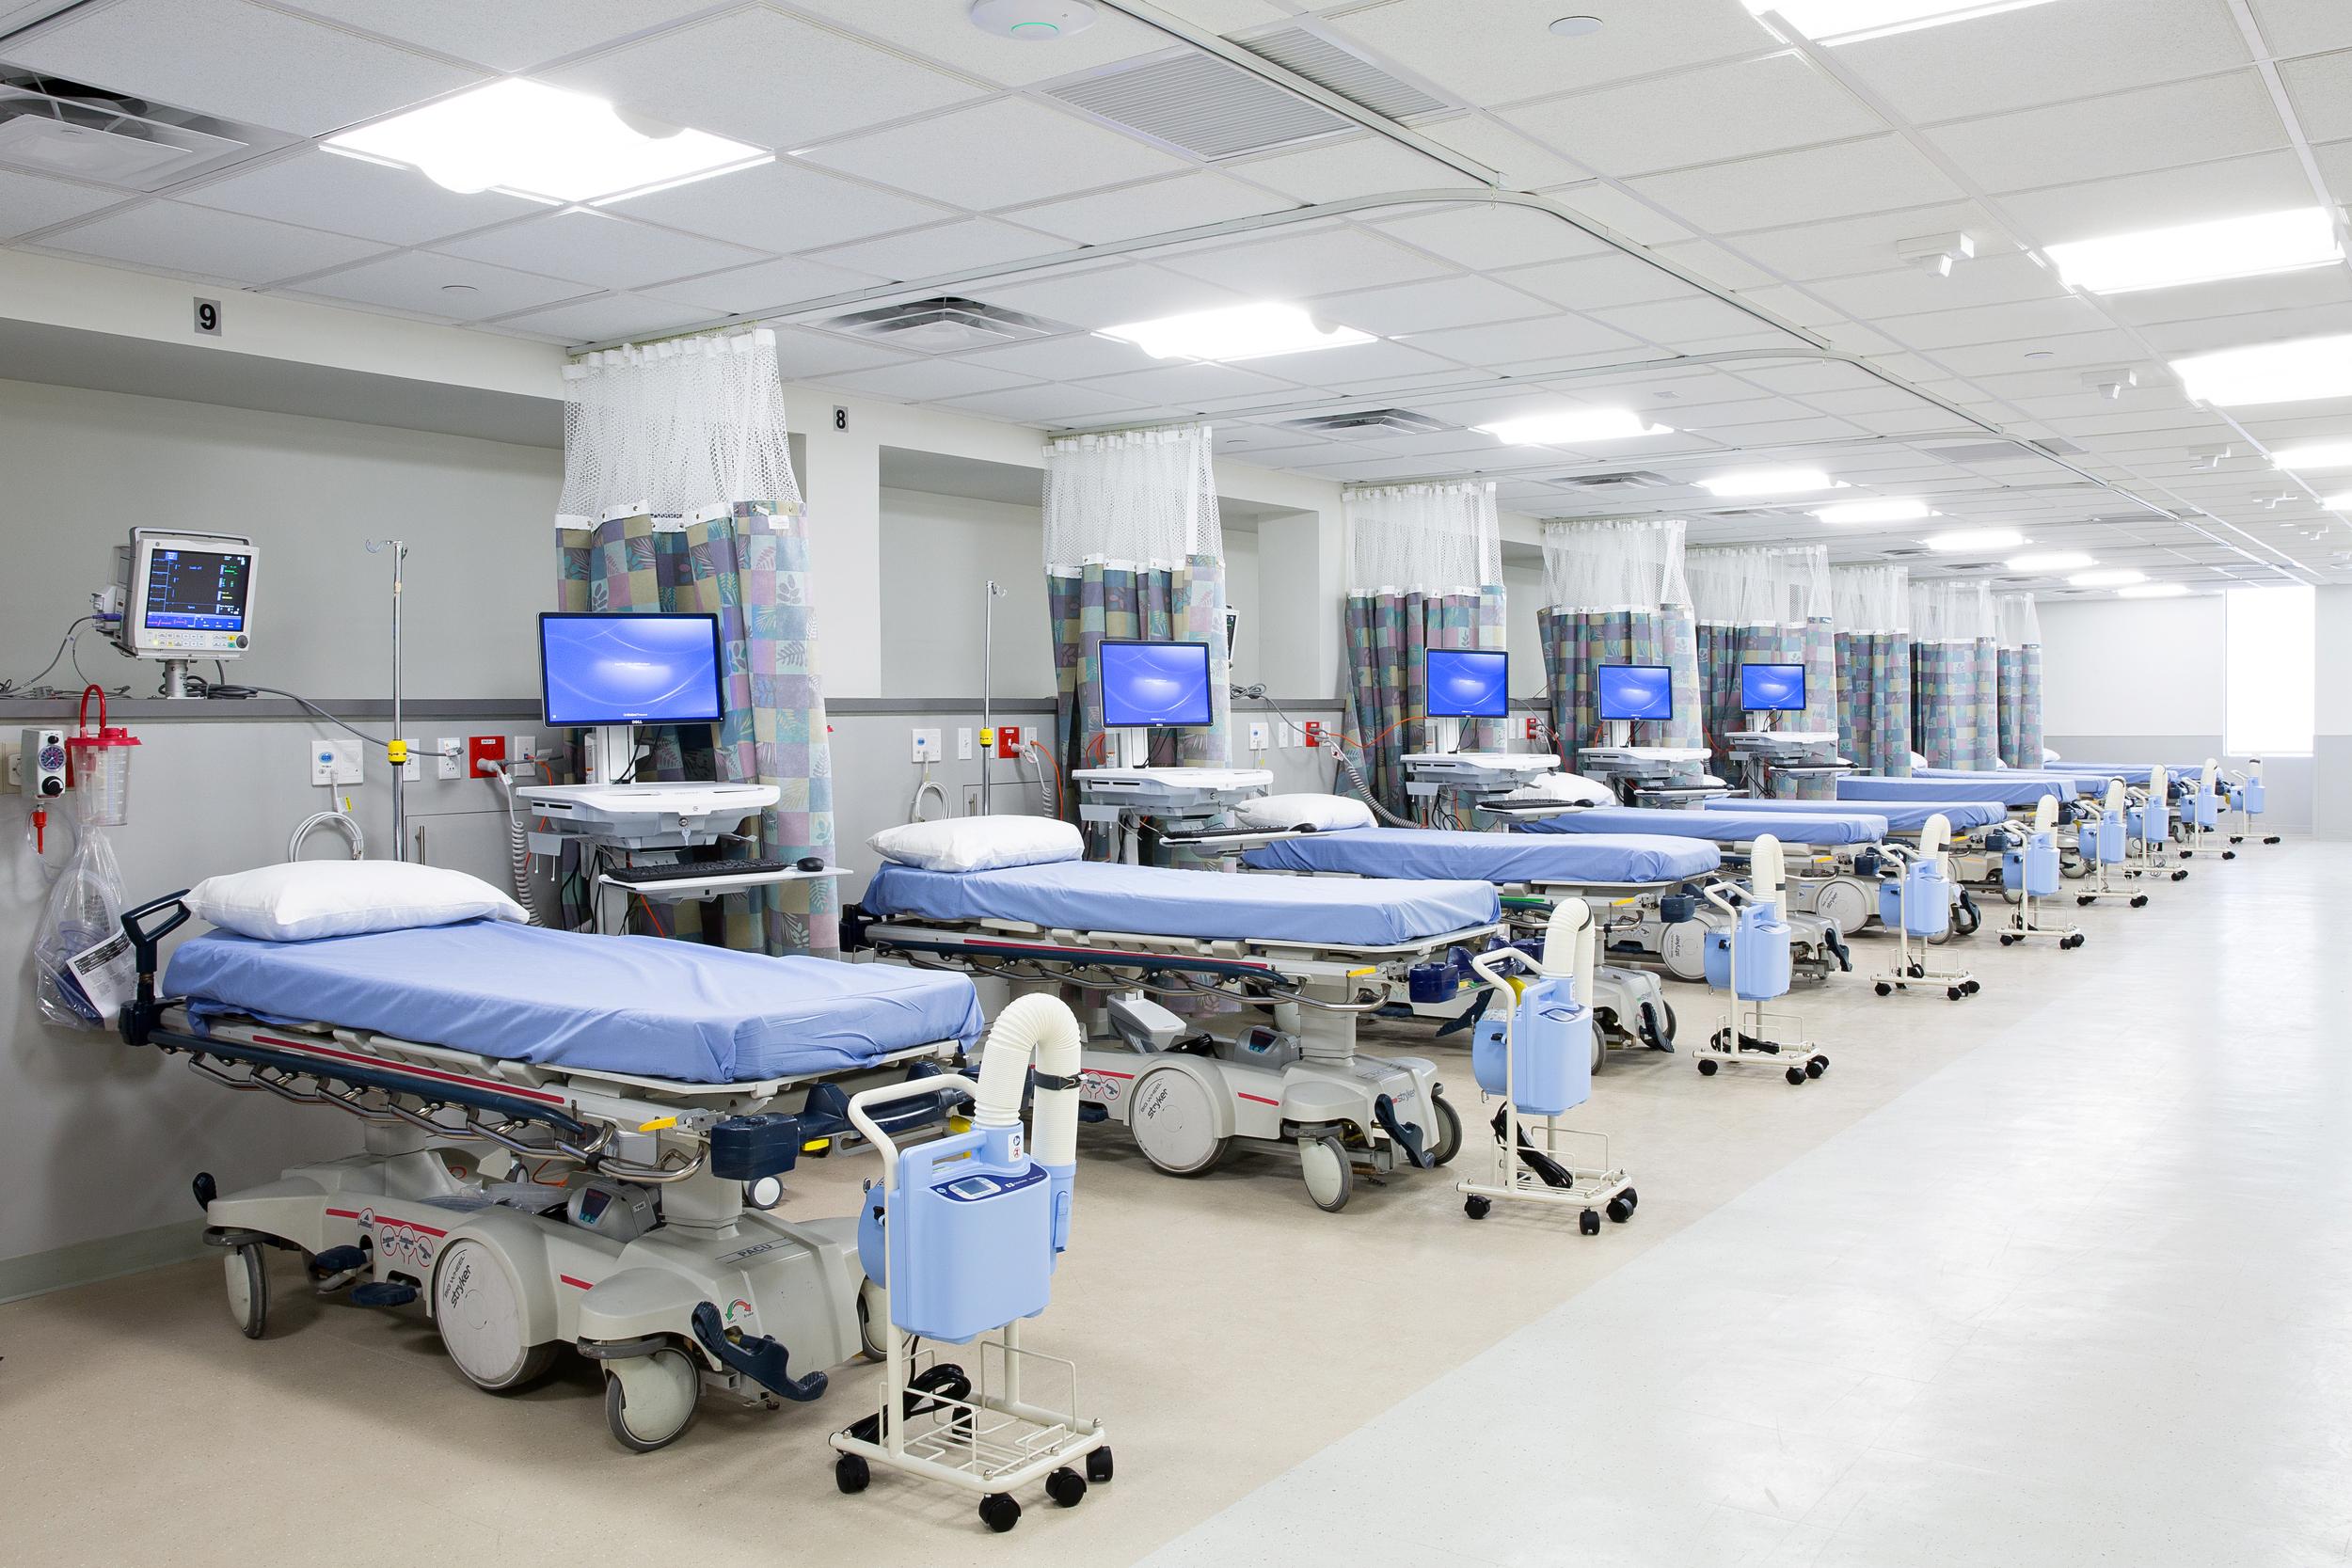 surgerycenter_113_edit.jpg